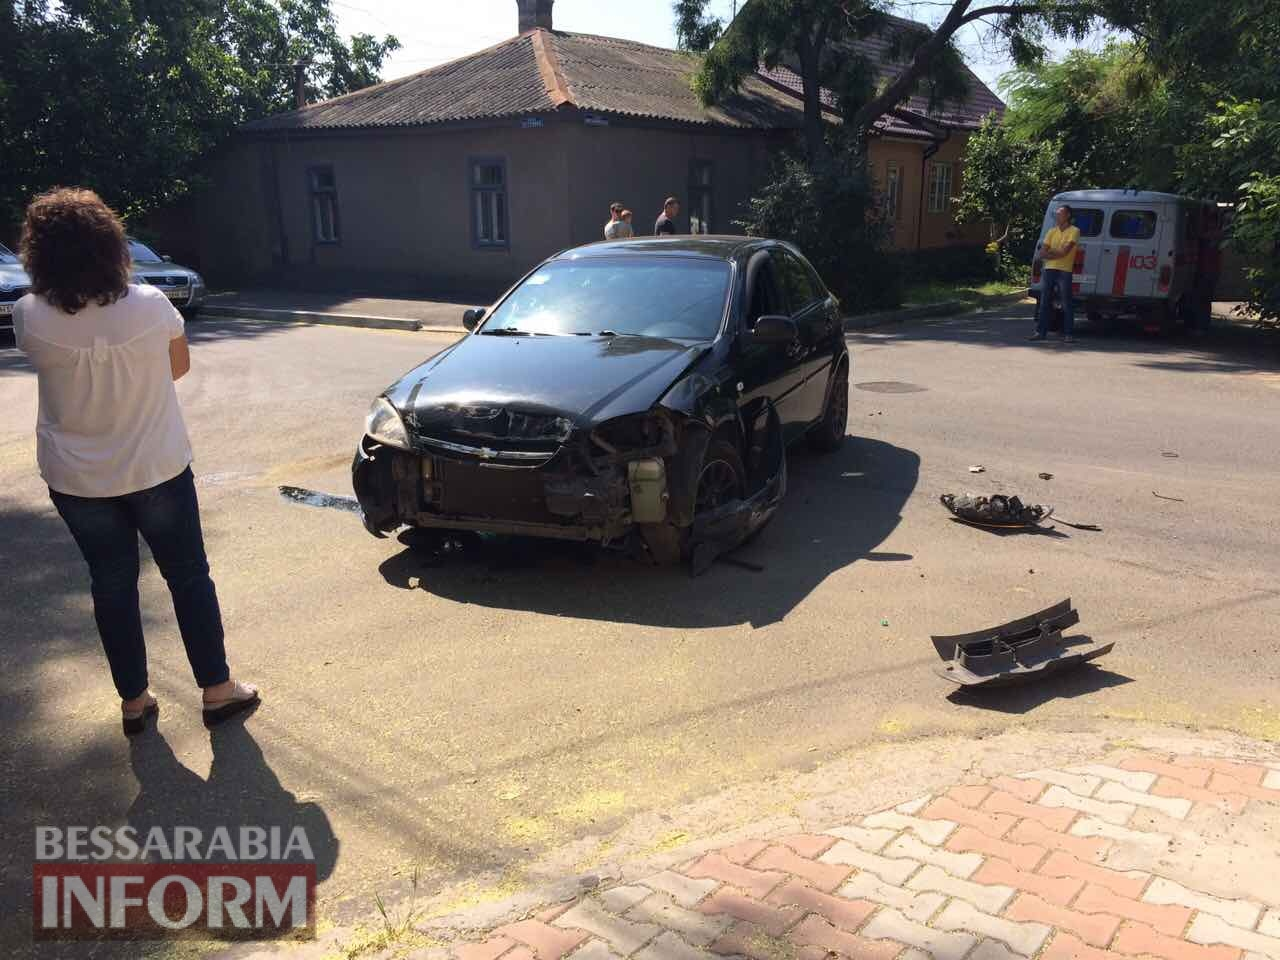 596f1fee2b867_346523 ДТП в Измаиле: Chevrolet Lacetti завалил на бок грузовой микроавтобус